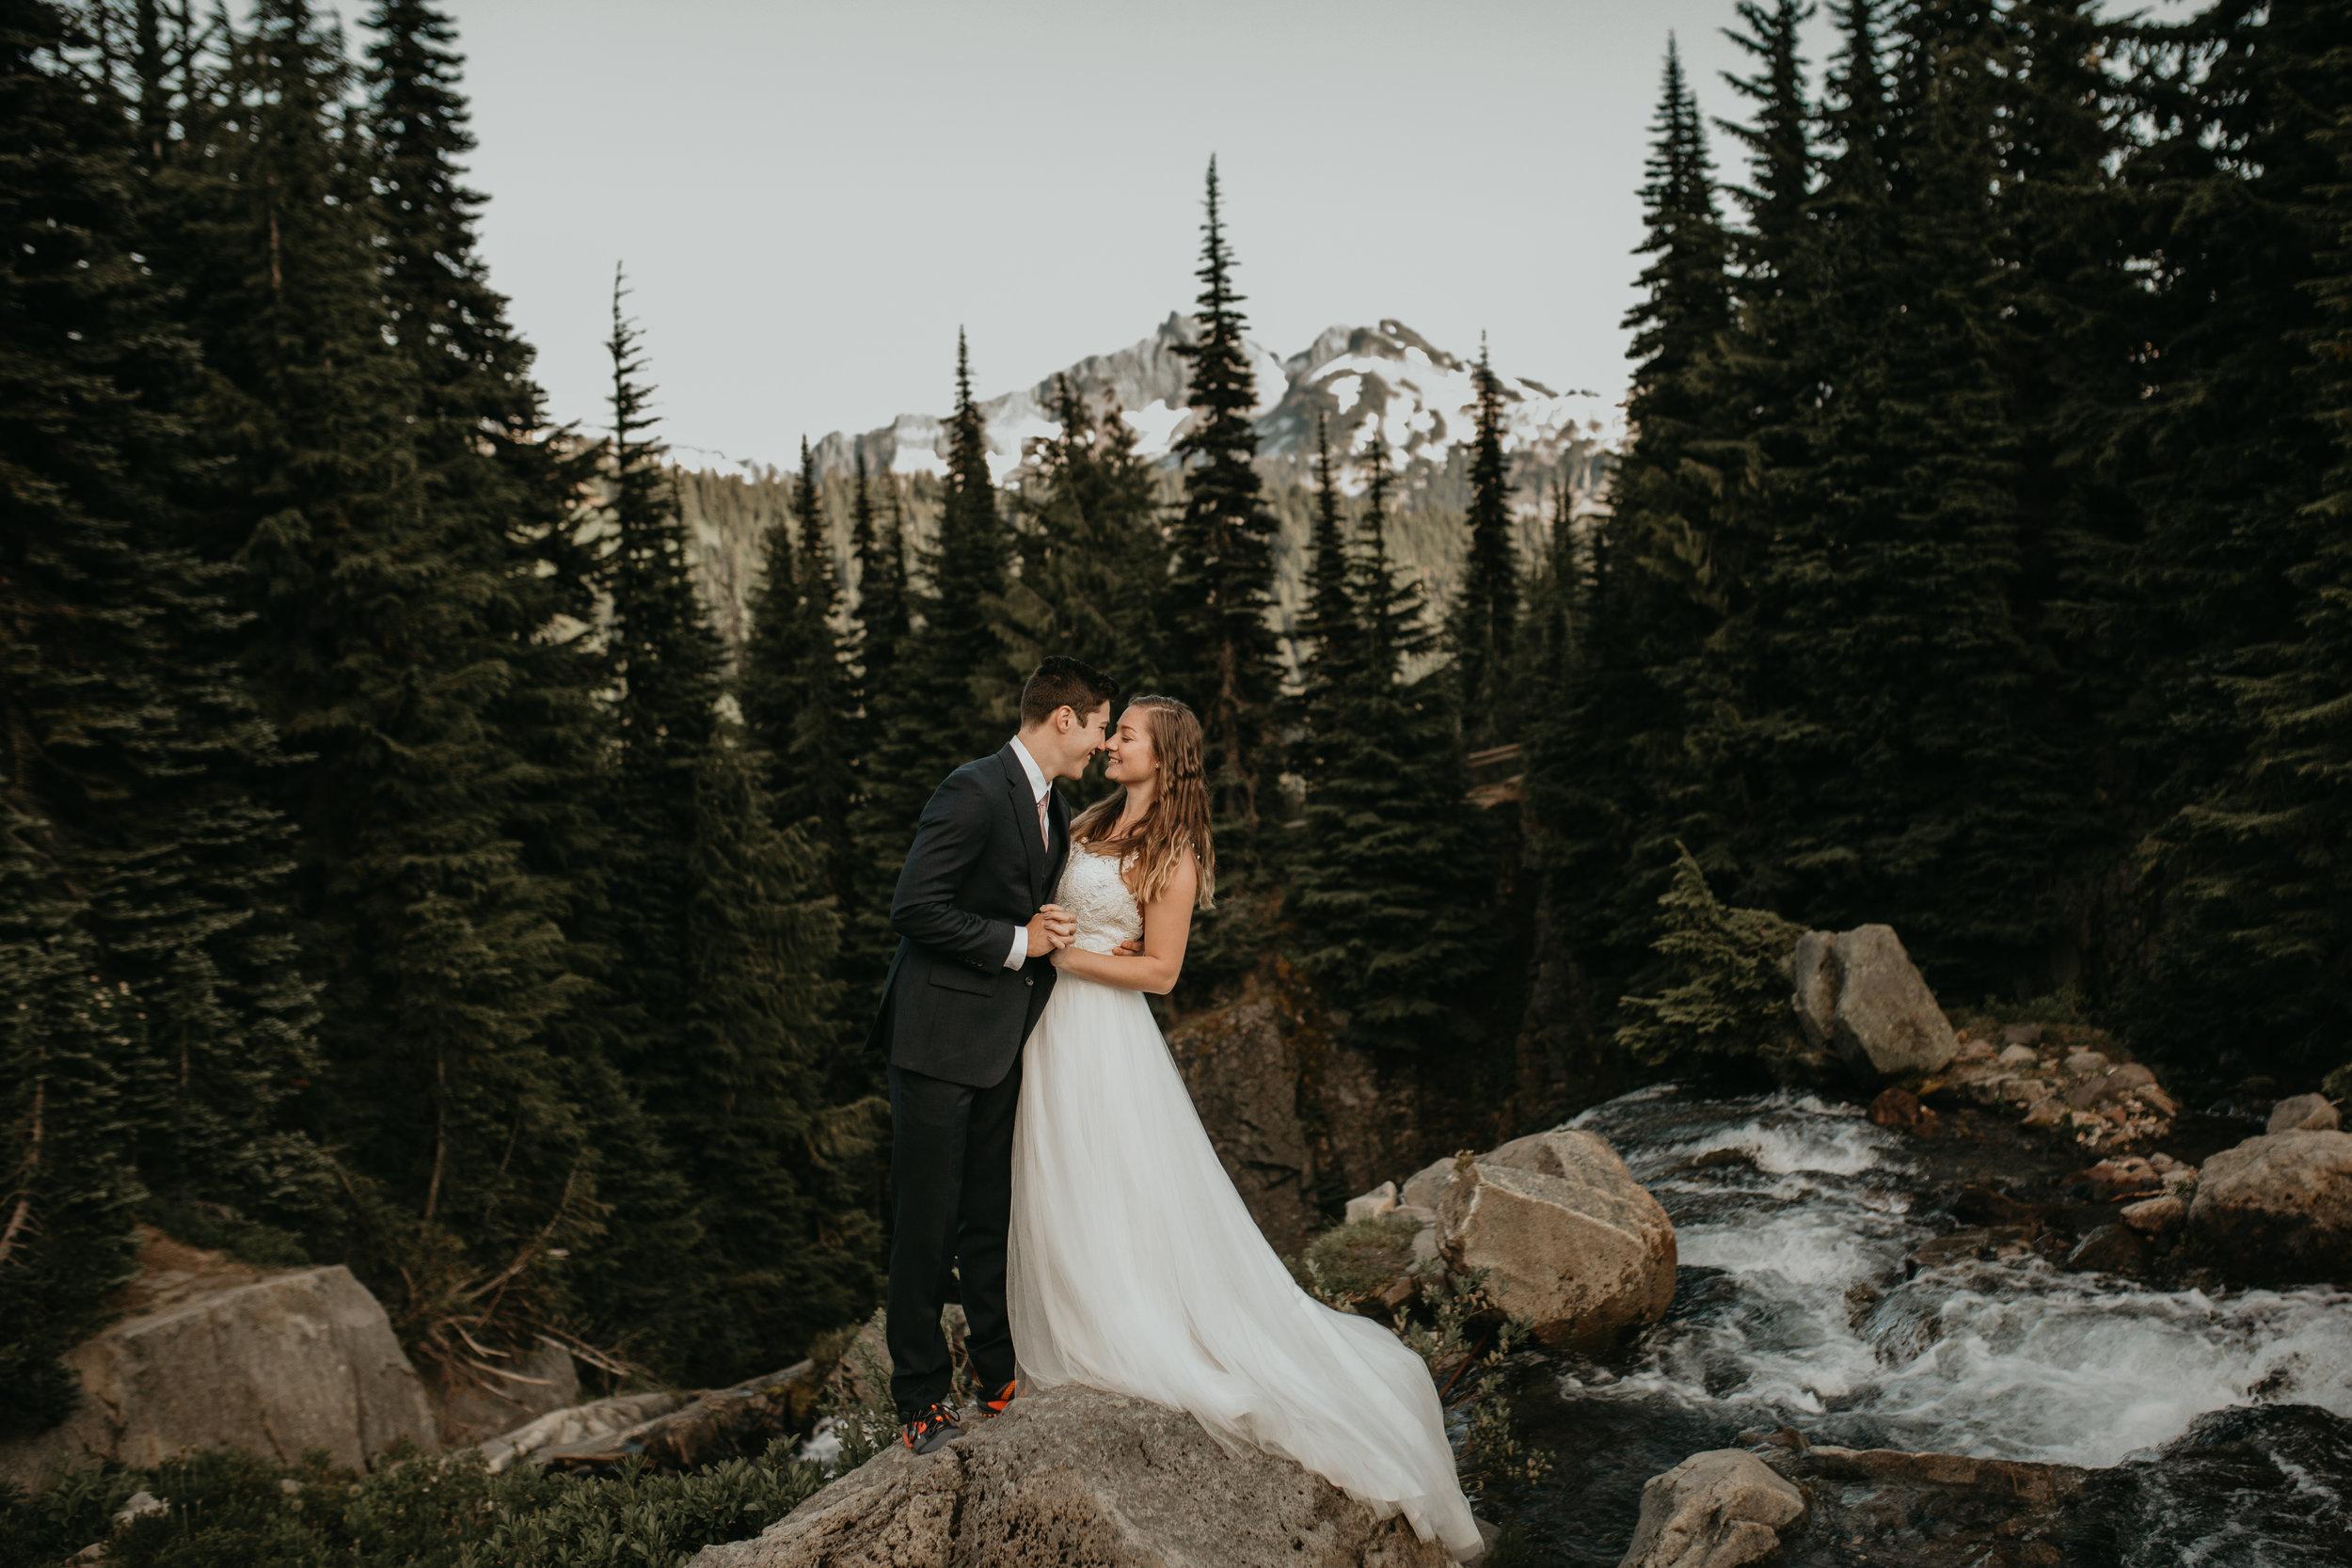 Nicole-Daacke-Photography-Mt-Rainier-elopement-photographer-washington-mountain-epic-wedding-photography-wildflowers-at-rainier-pine-tree-cloudy-summer-day-at-mountain-rainier-16.jpg